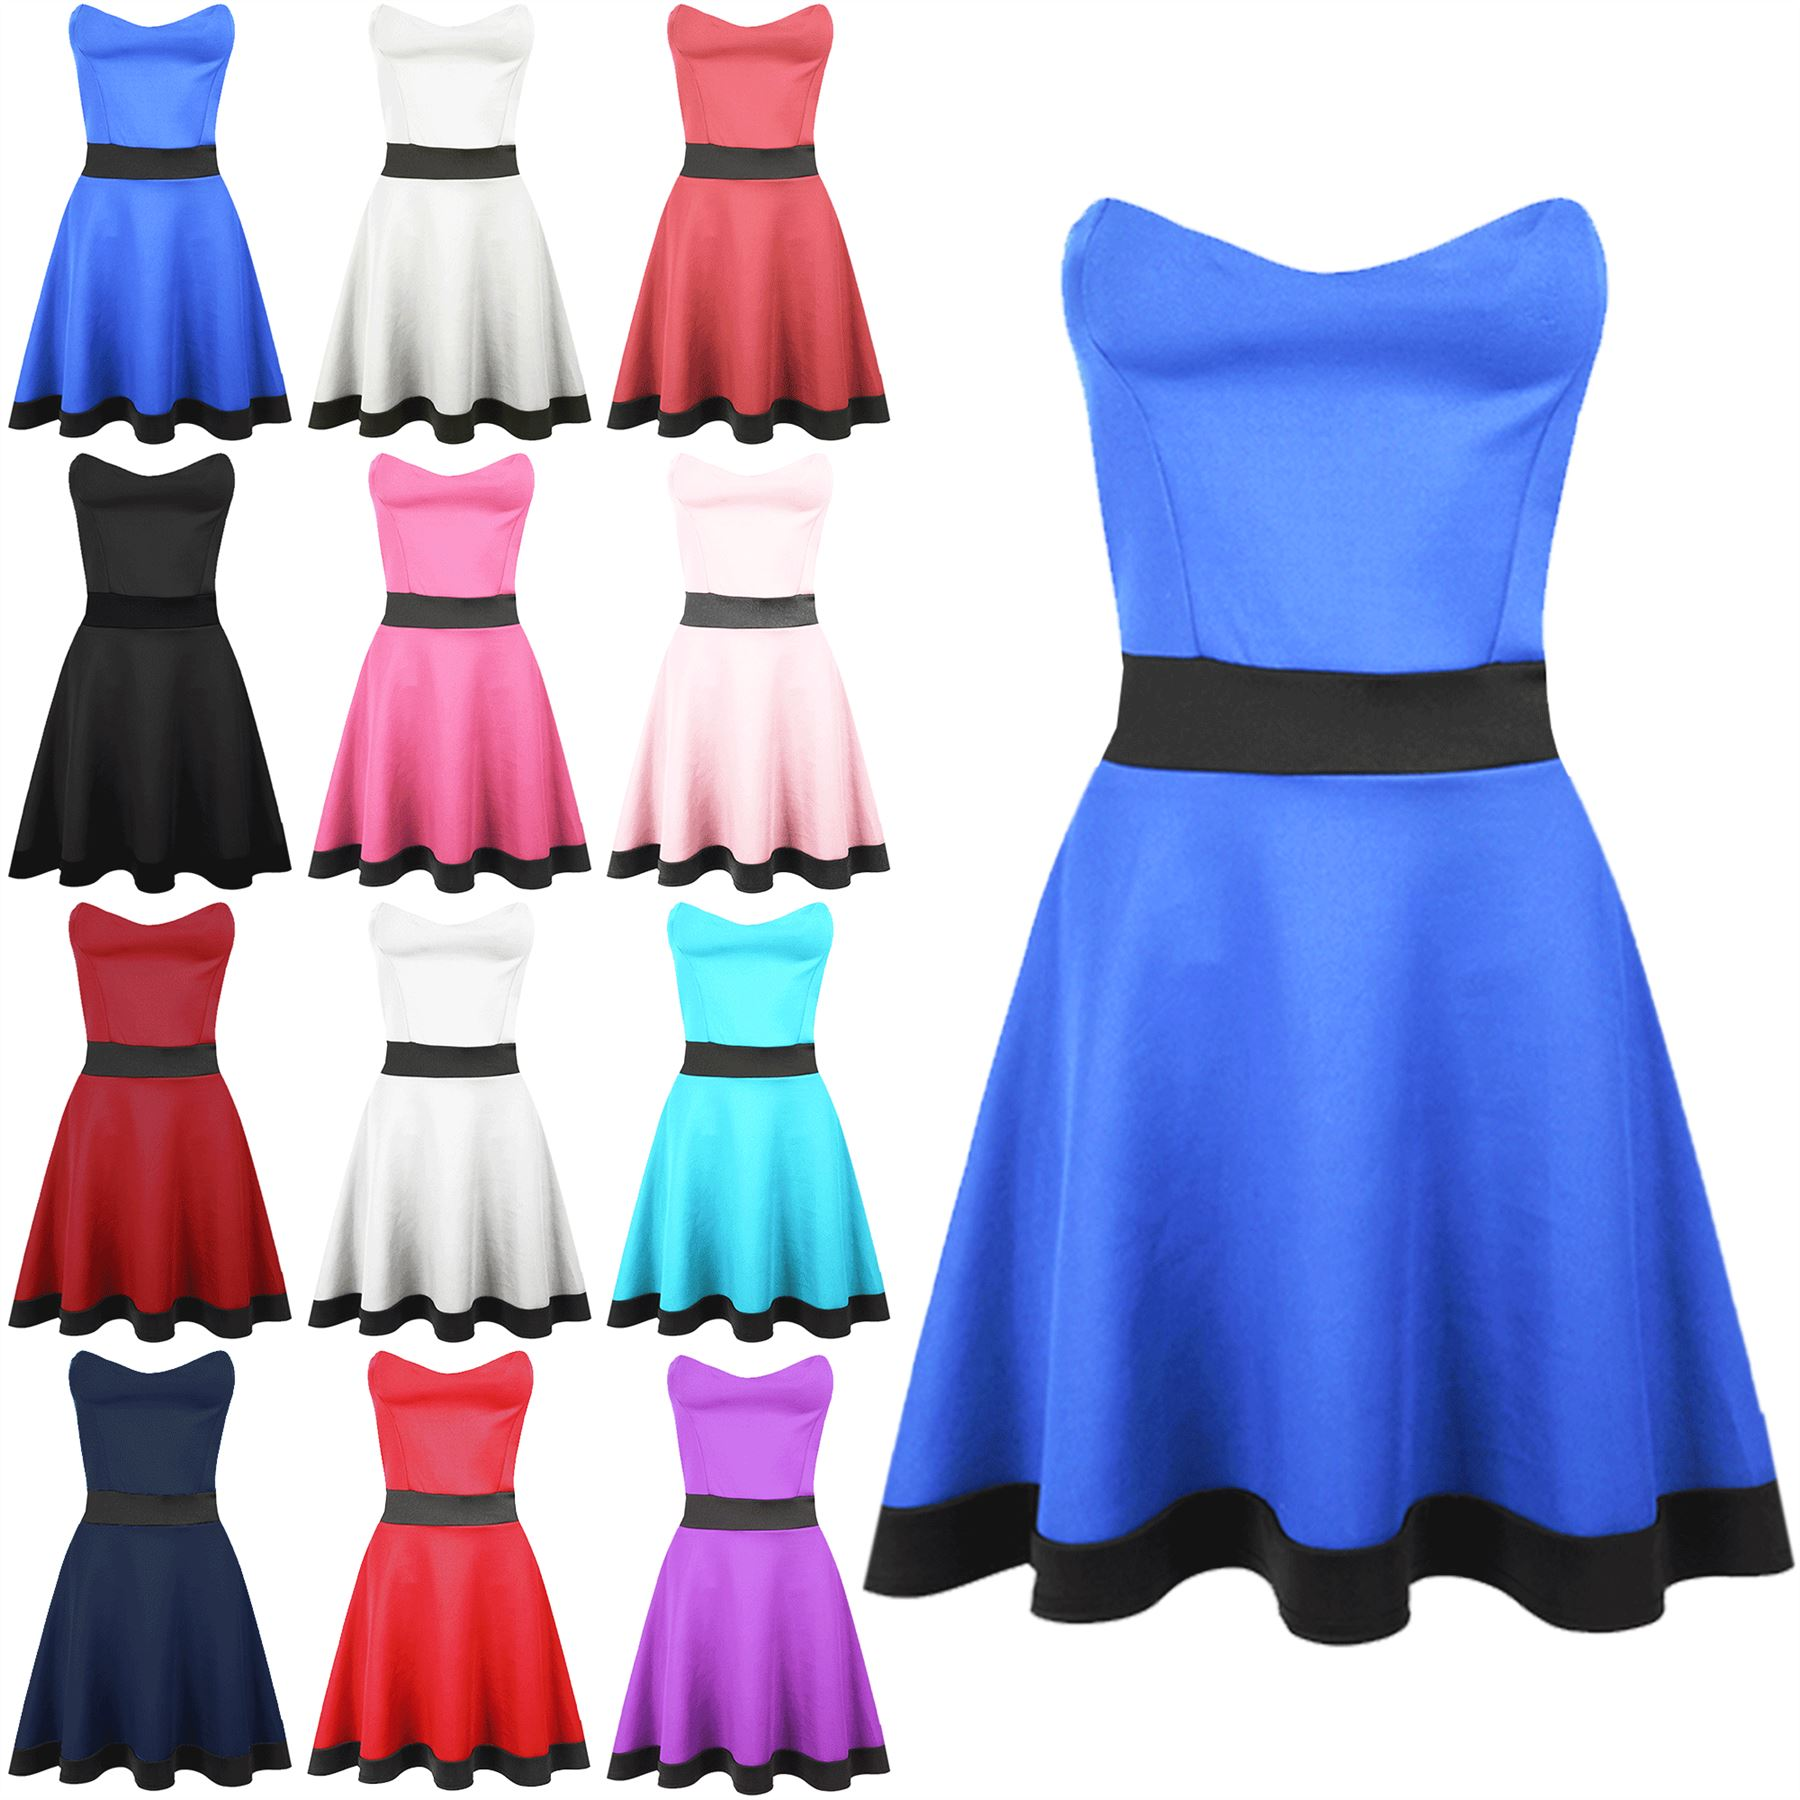 Womens Ladies Contrast Panel Strapless Bandeau Boobtube Flared Mini Skater Dress